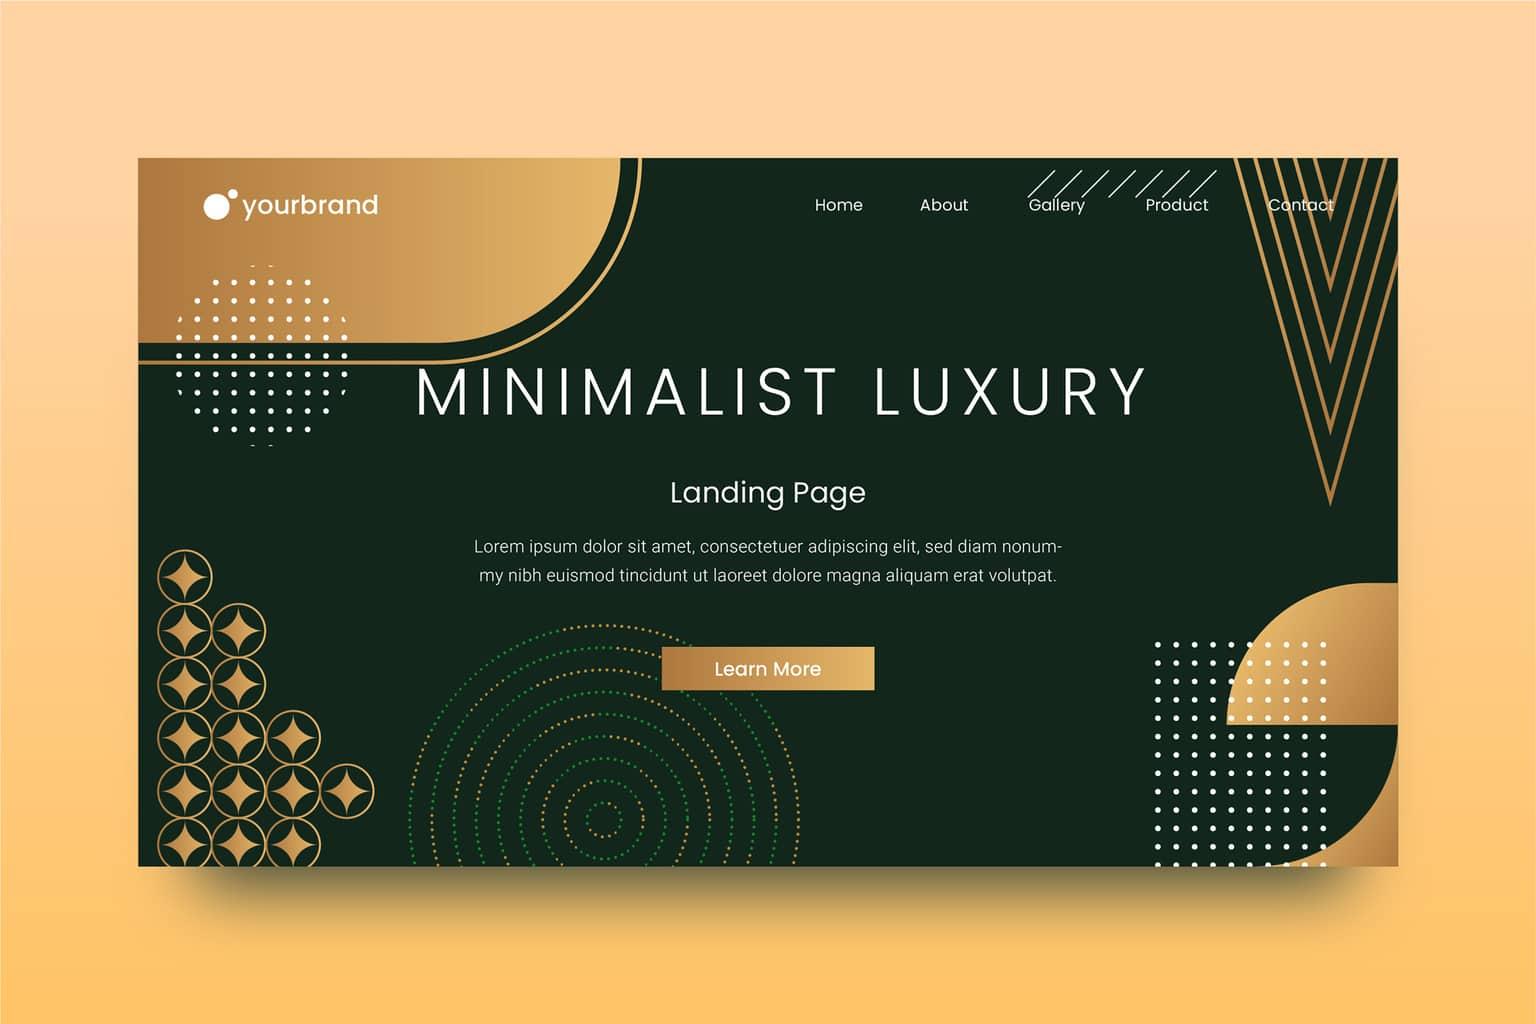 abstract background minimalist luxury design